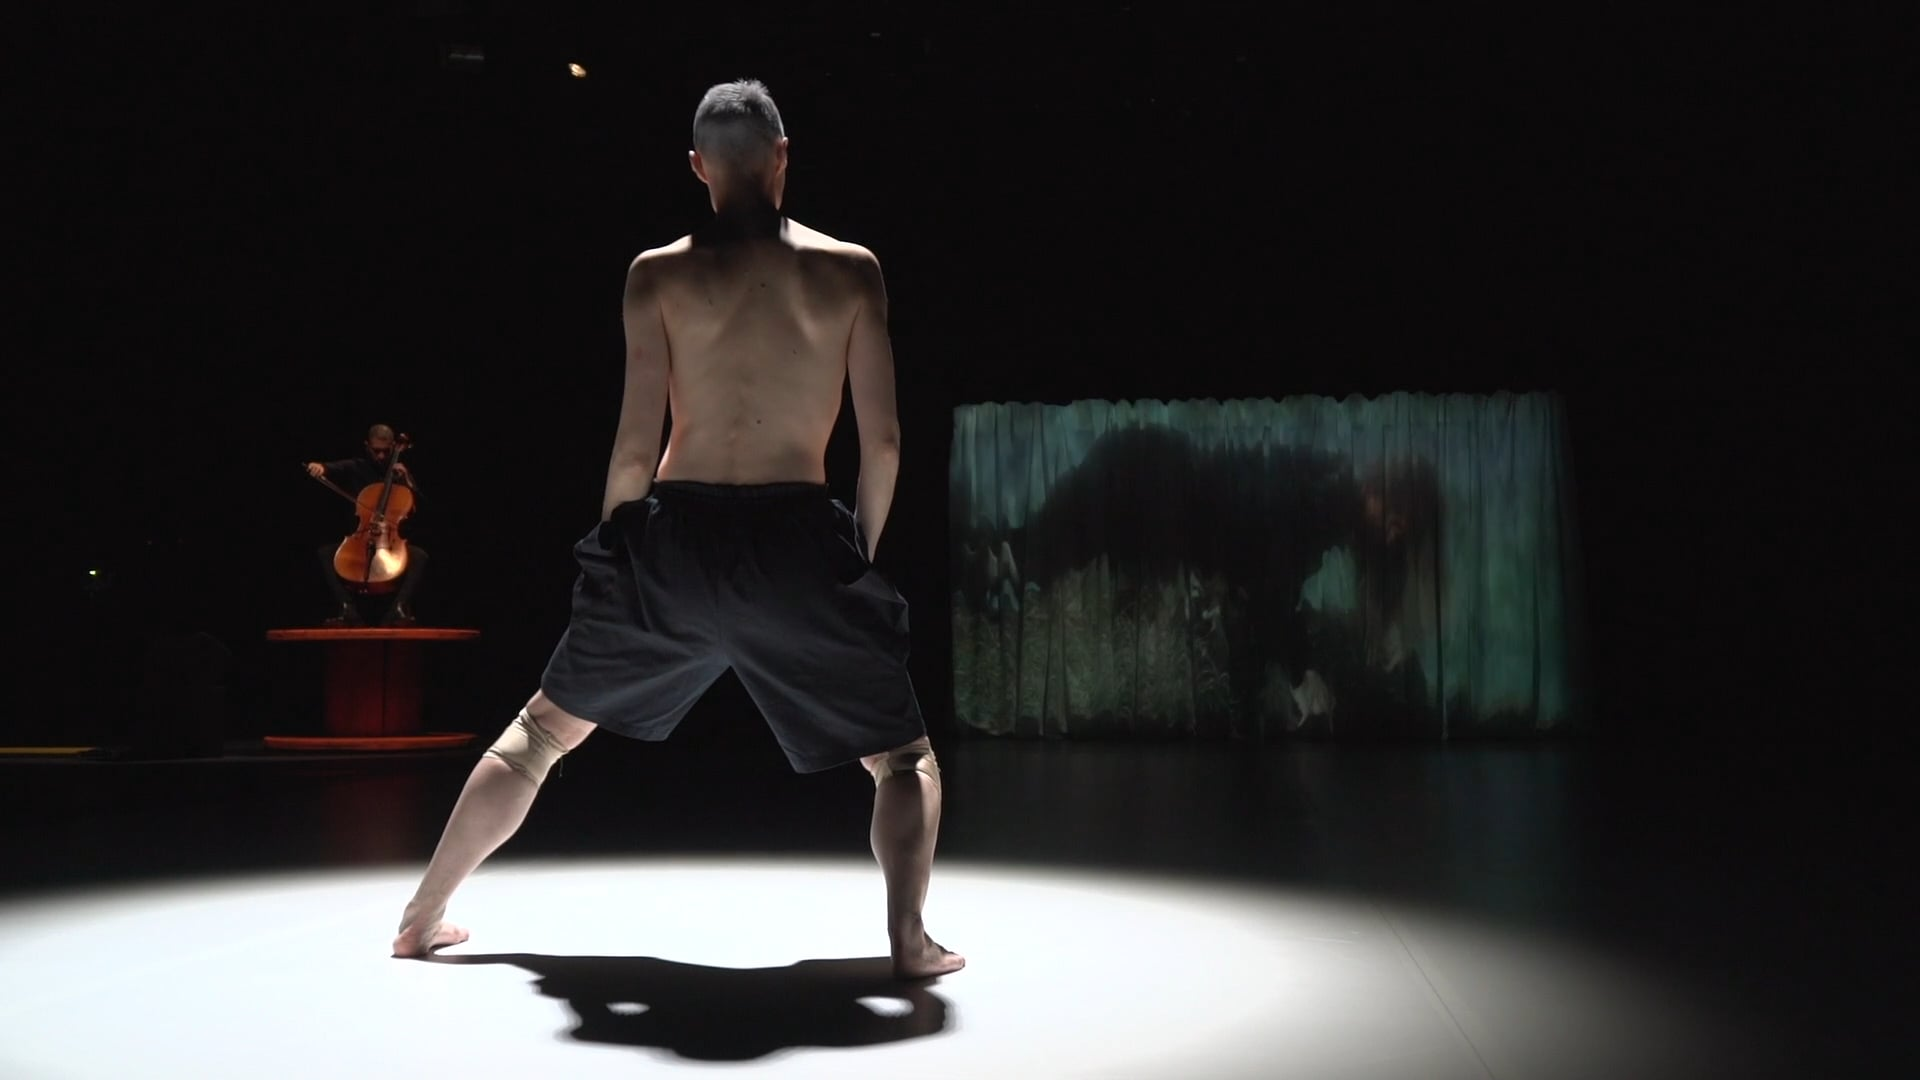 'Crossing Latitudes' - Dance Performance - Espoo City Theatre, FINLAND - Choreographer: Favela Vera Ortiz